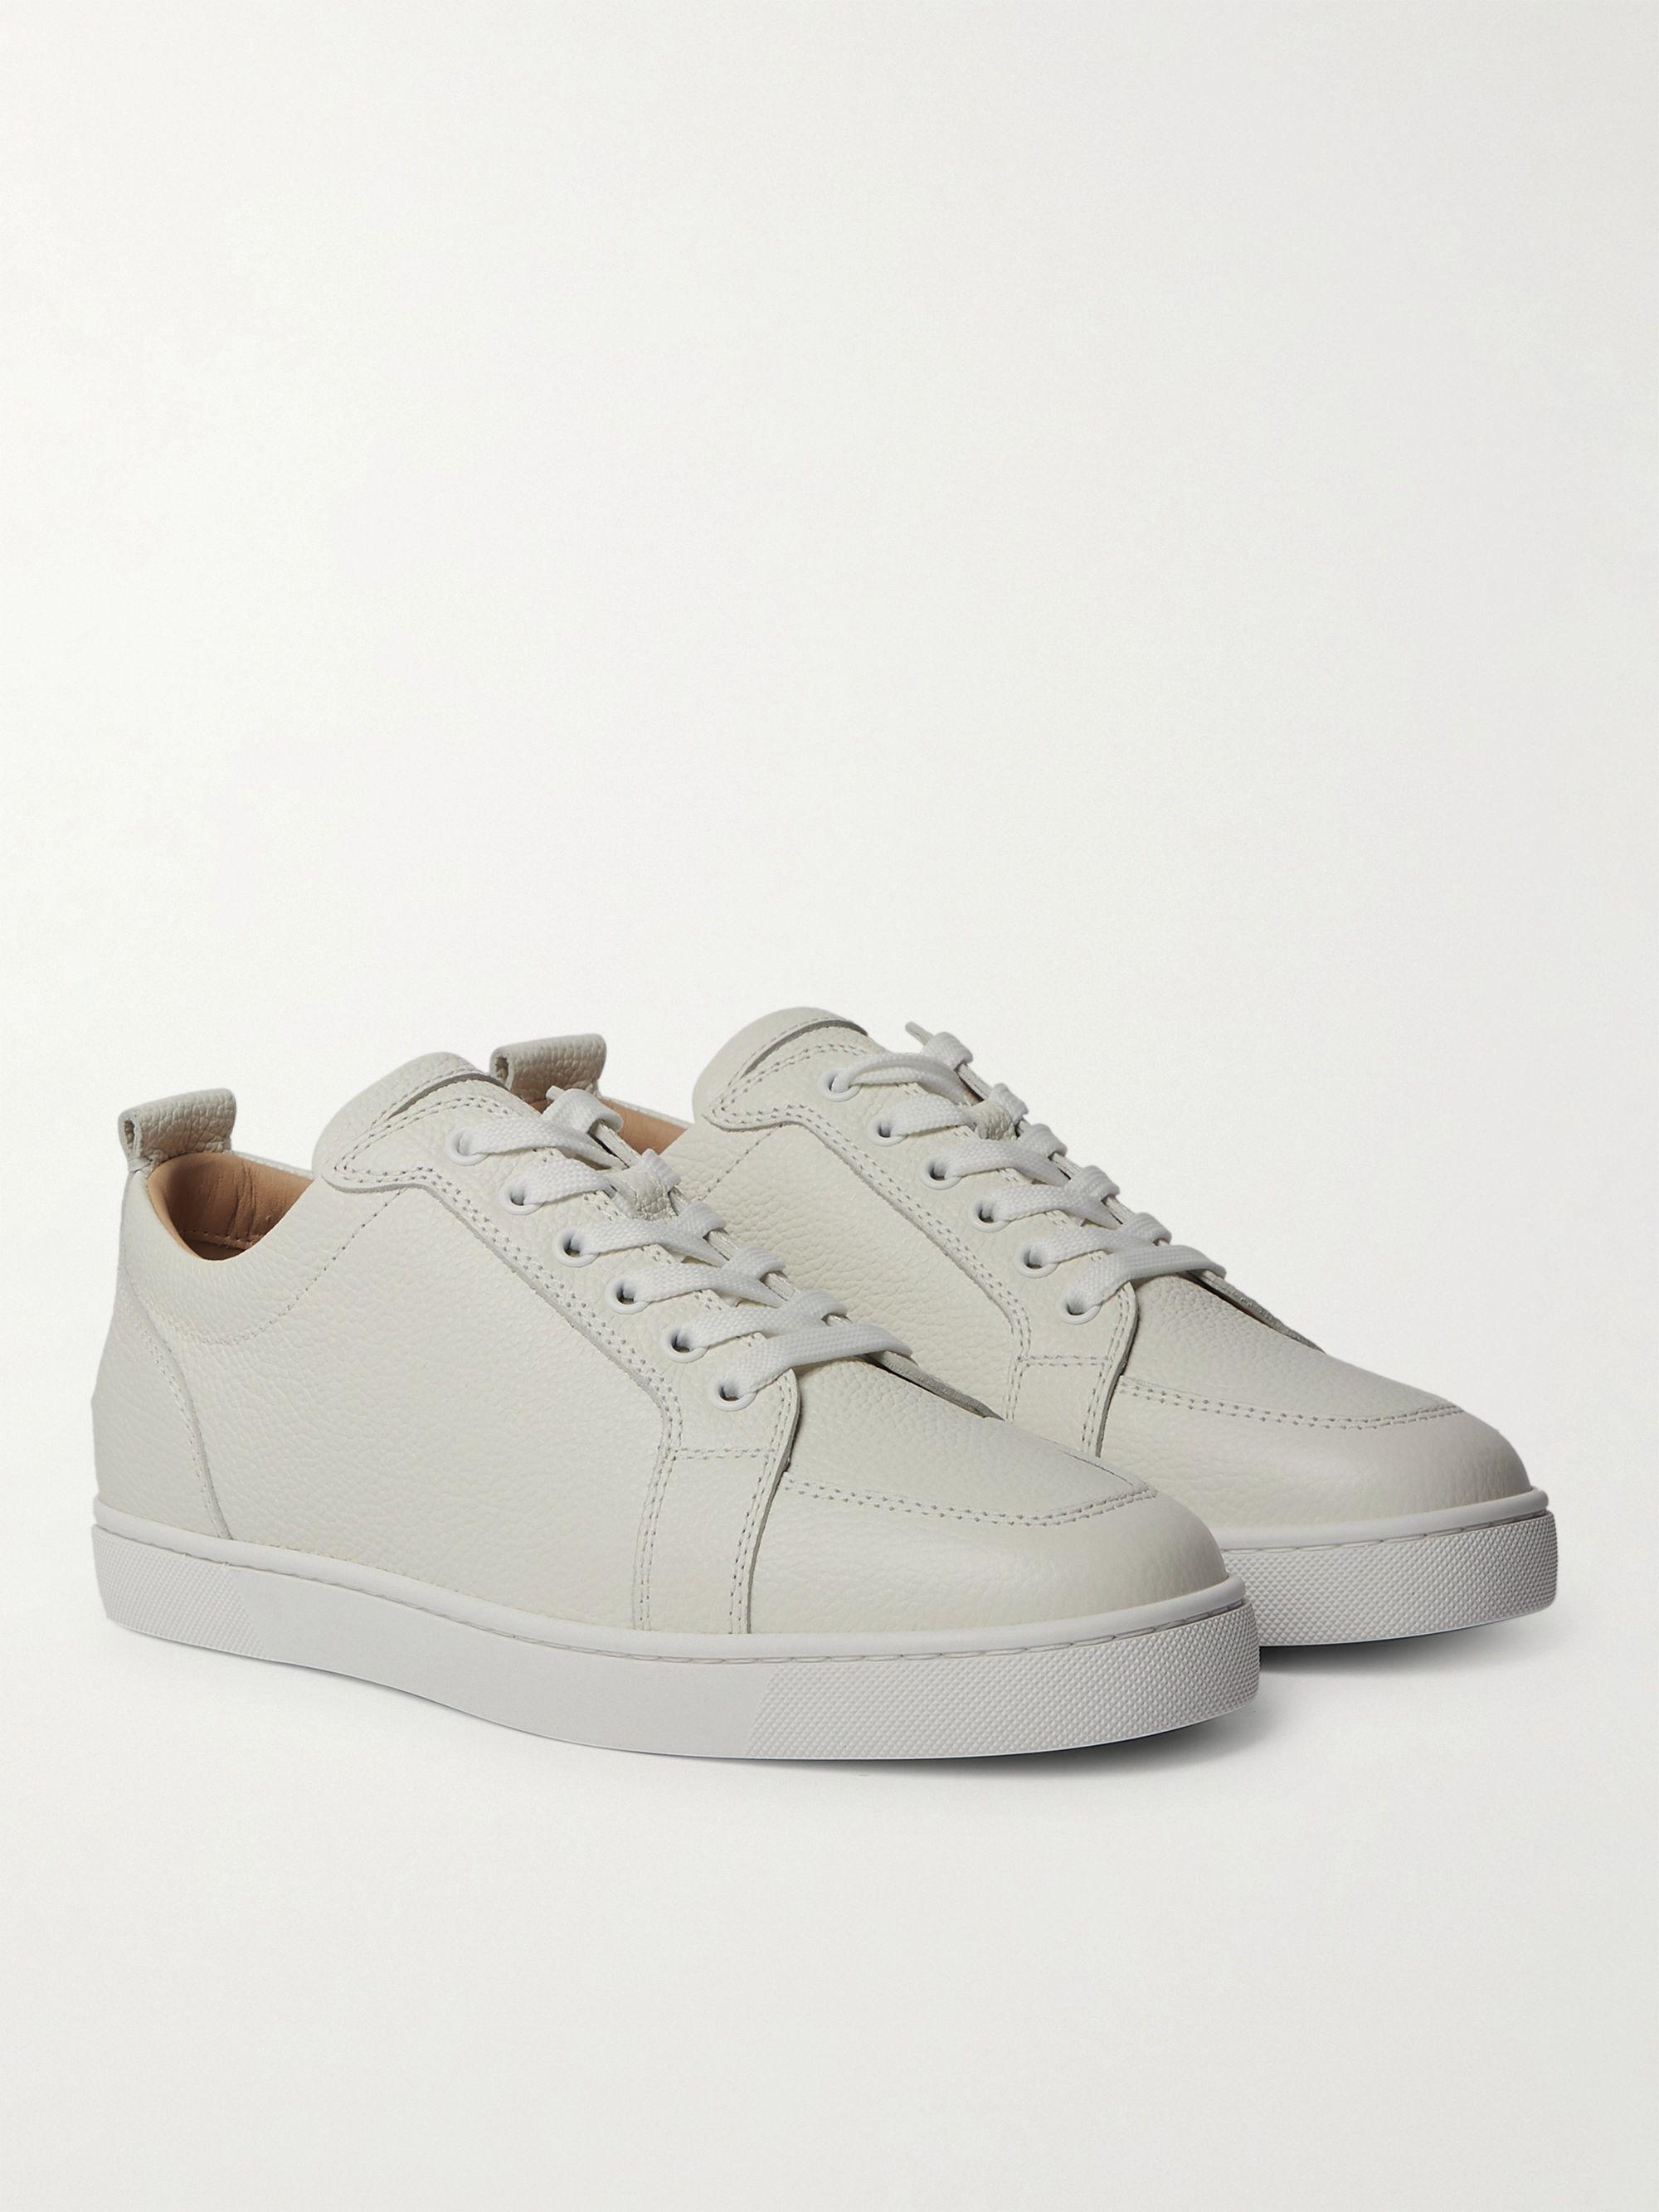 Off-white Rantulow Full-Grain Leather